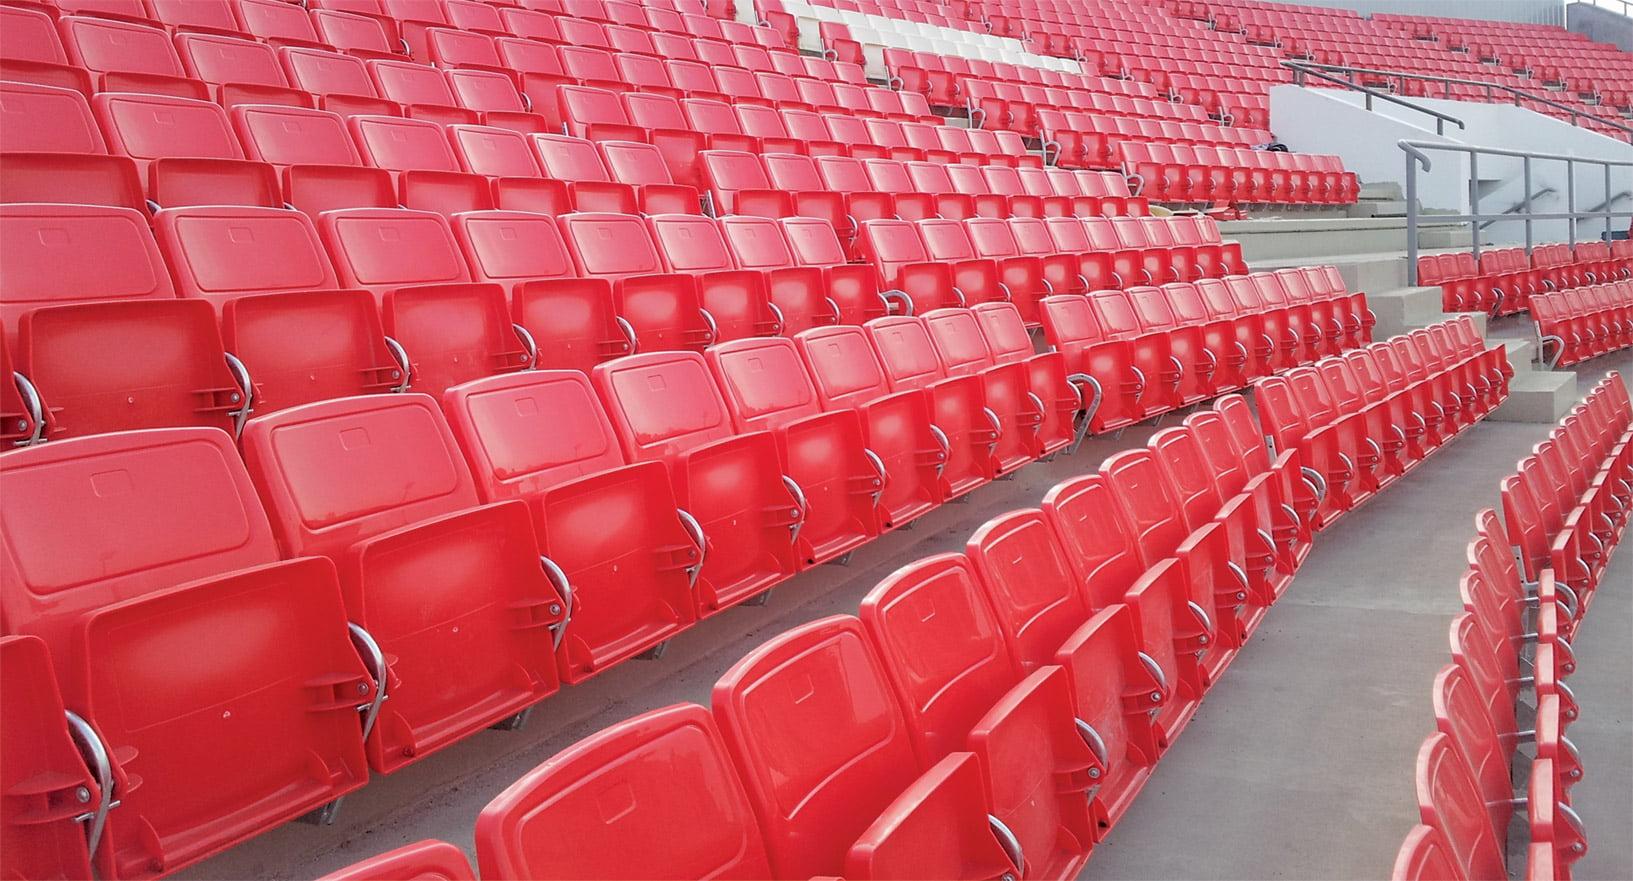 stadiumchairs08